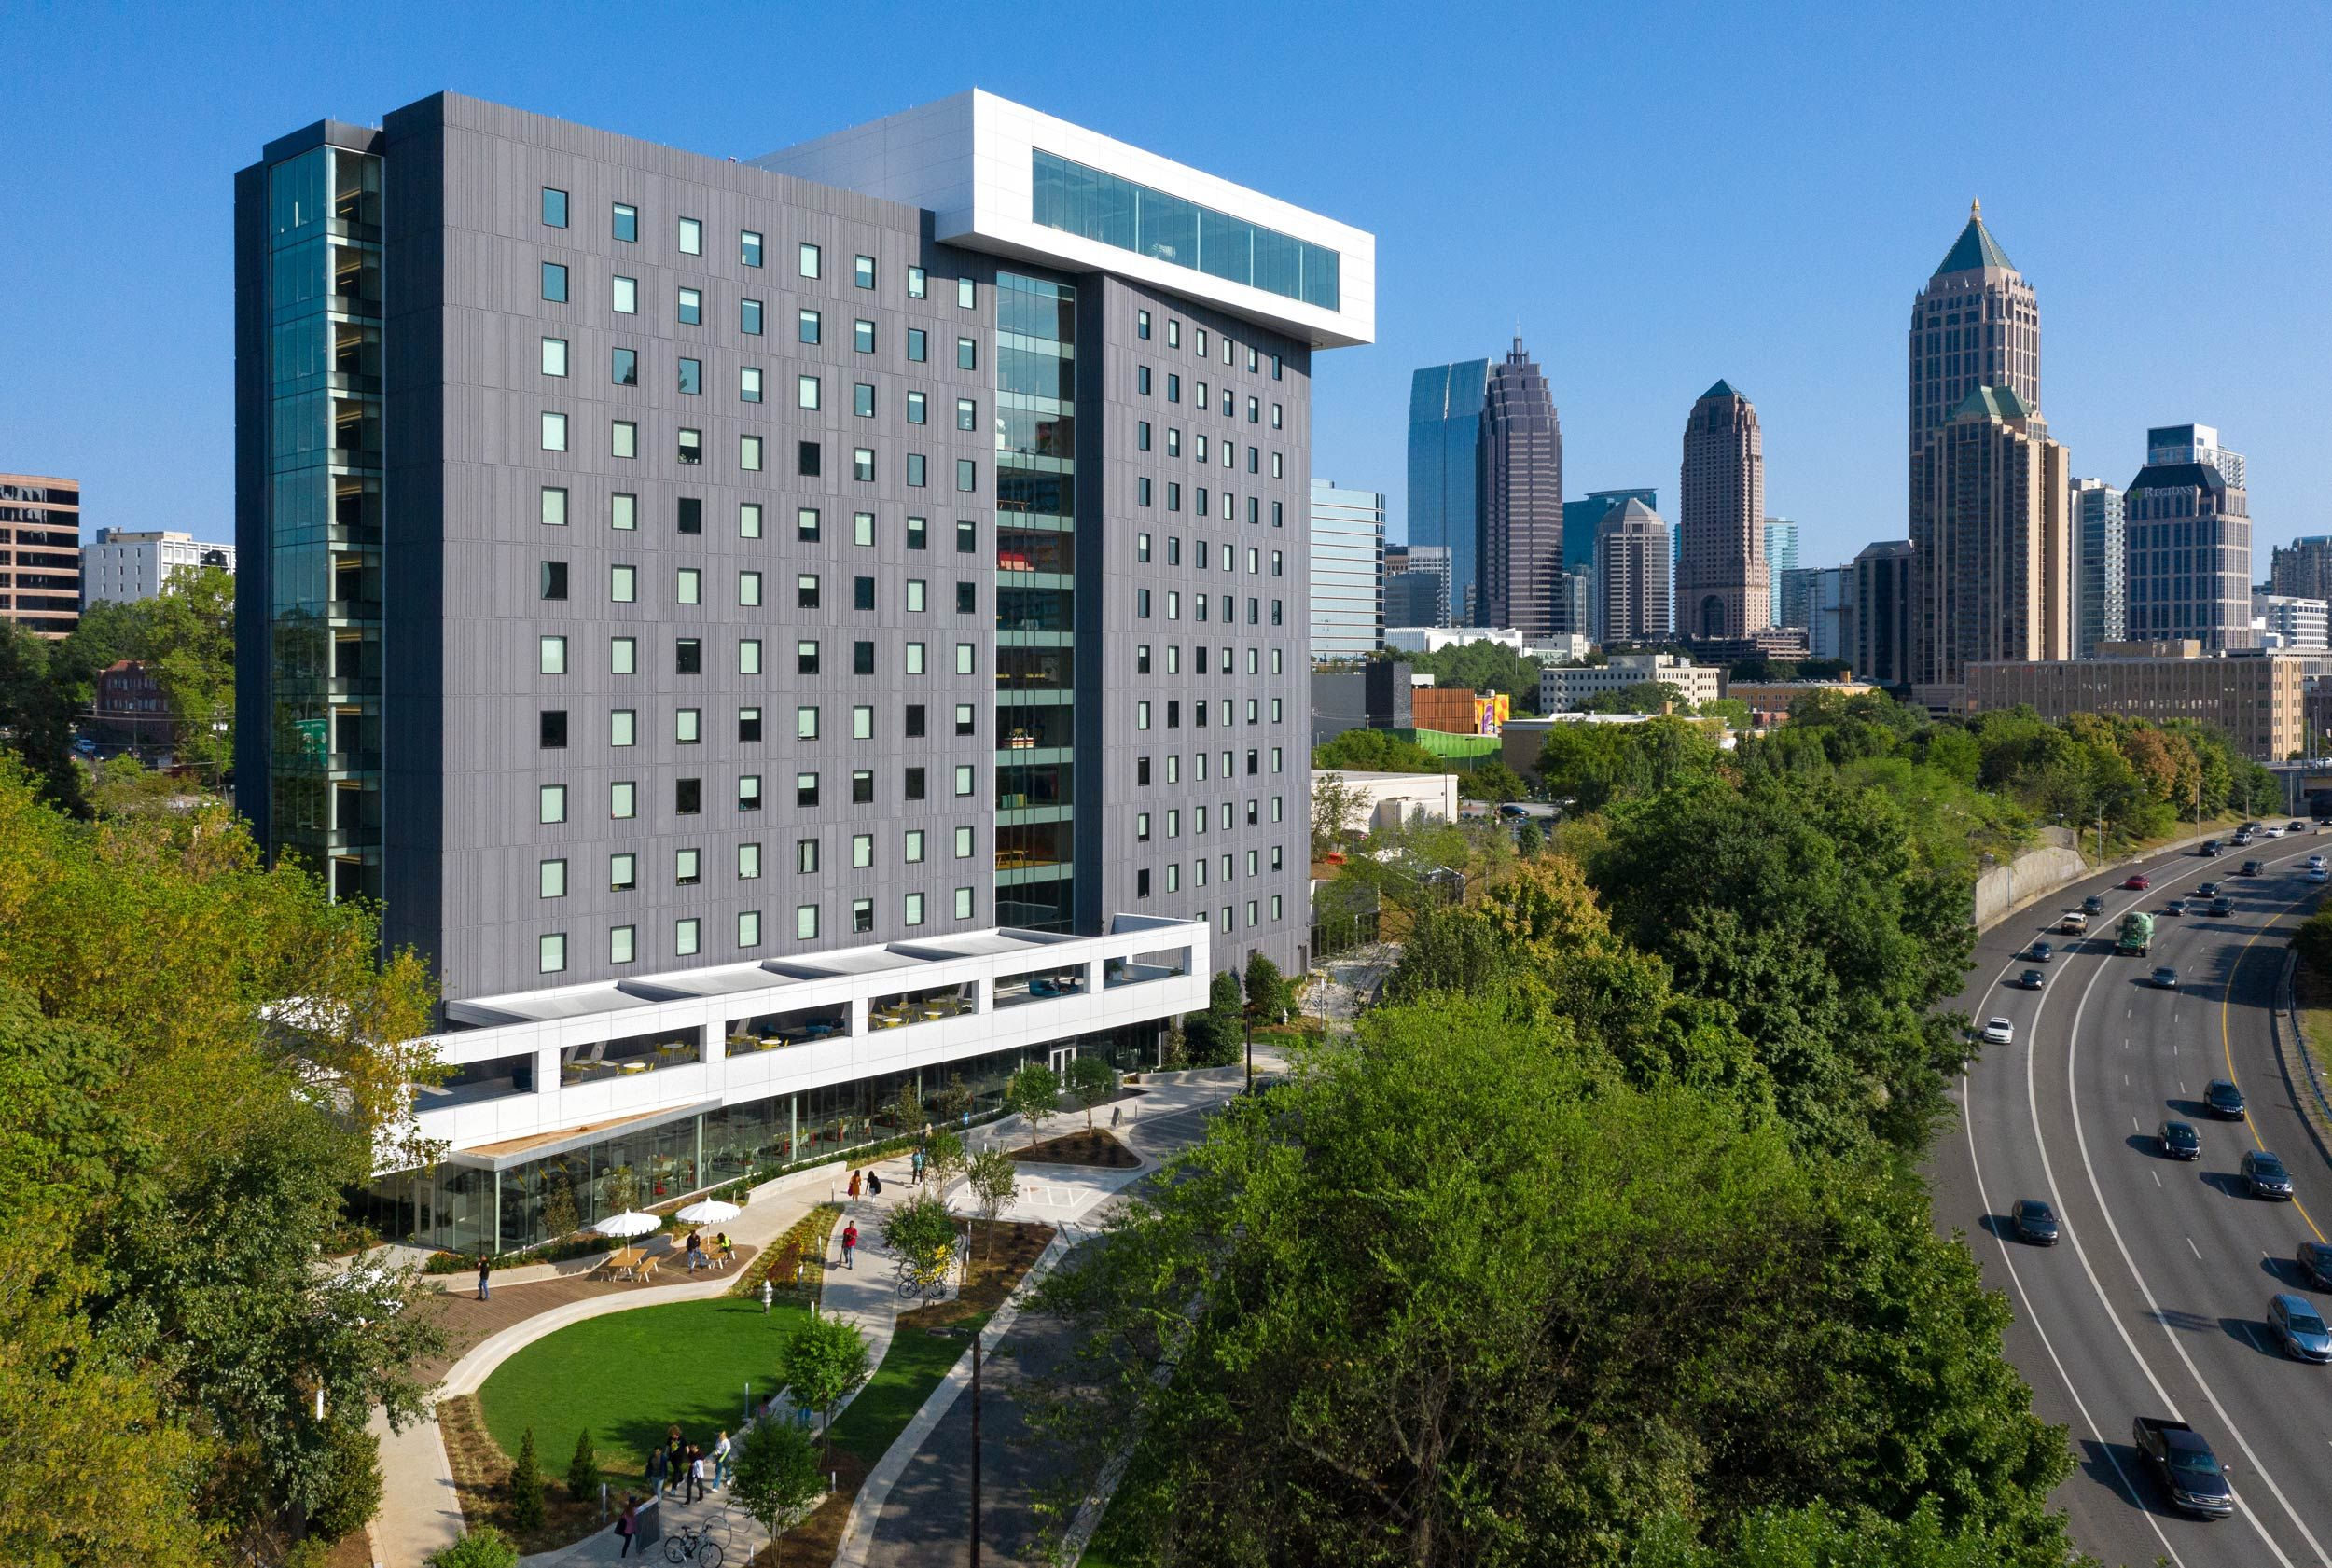 Lamar Johnson Collaborative, Mackey Mitchell, and Clayco / SCAD Forty Residence Hall, Atlanta